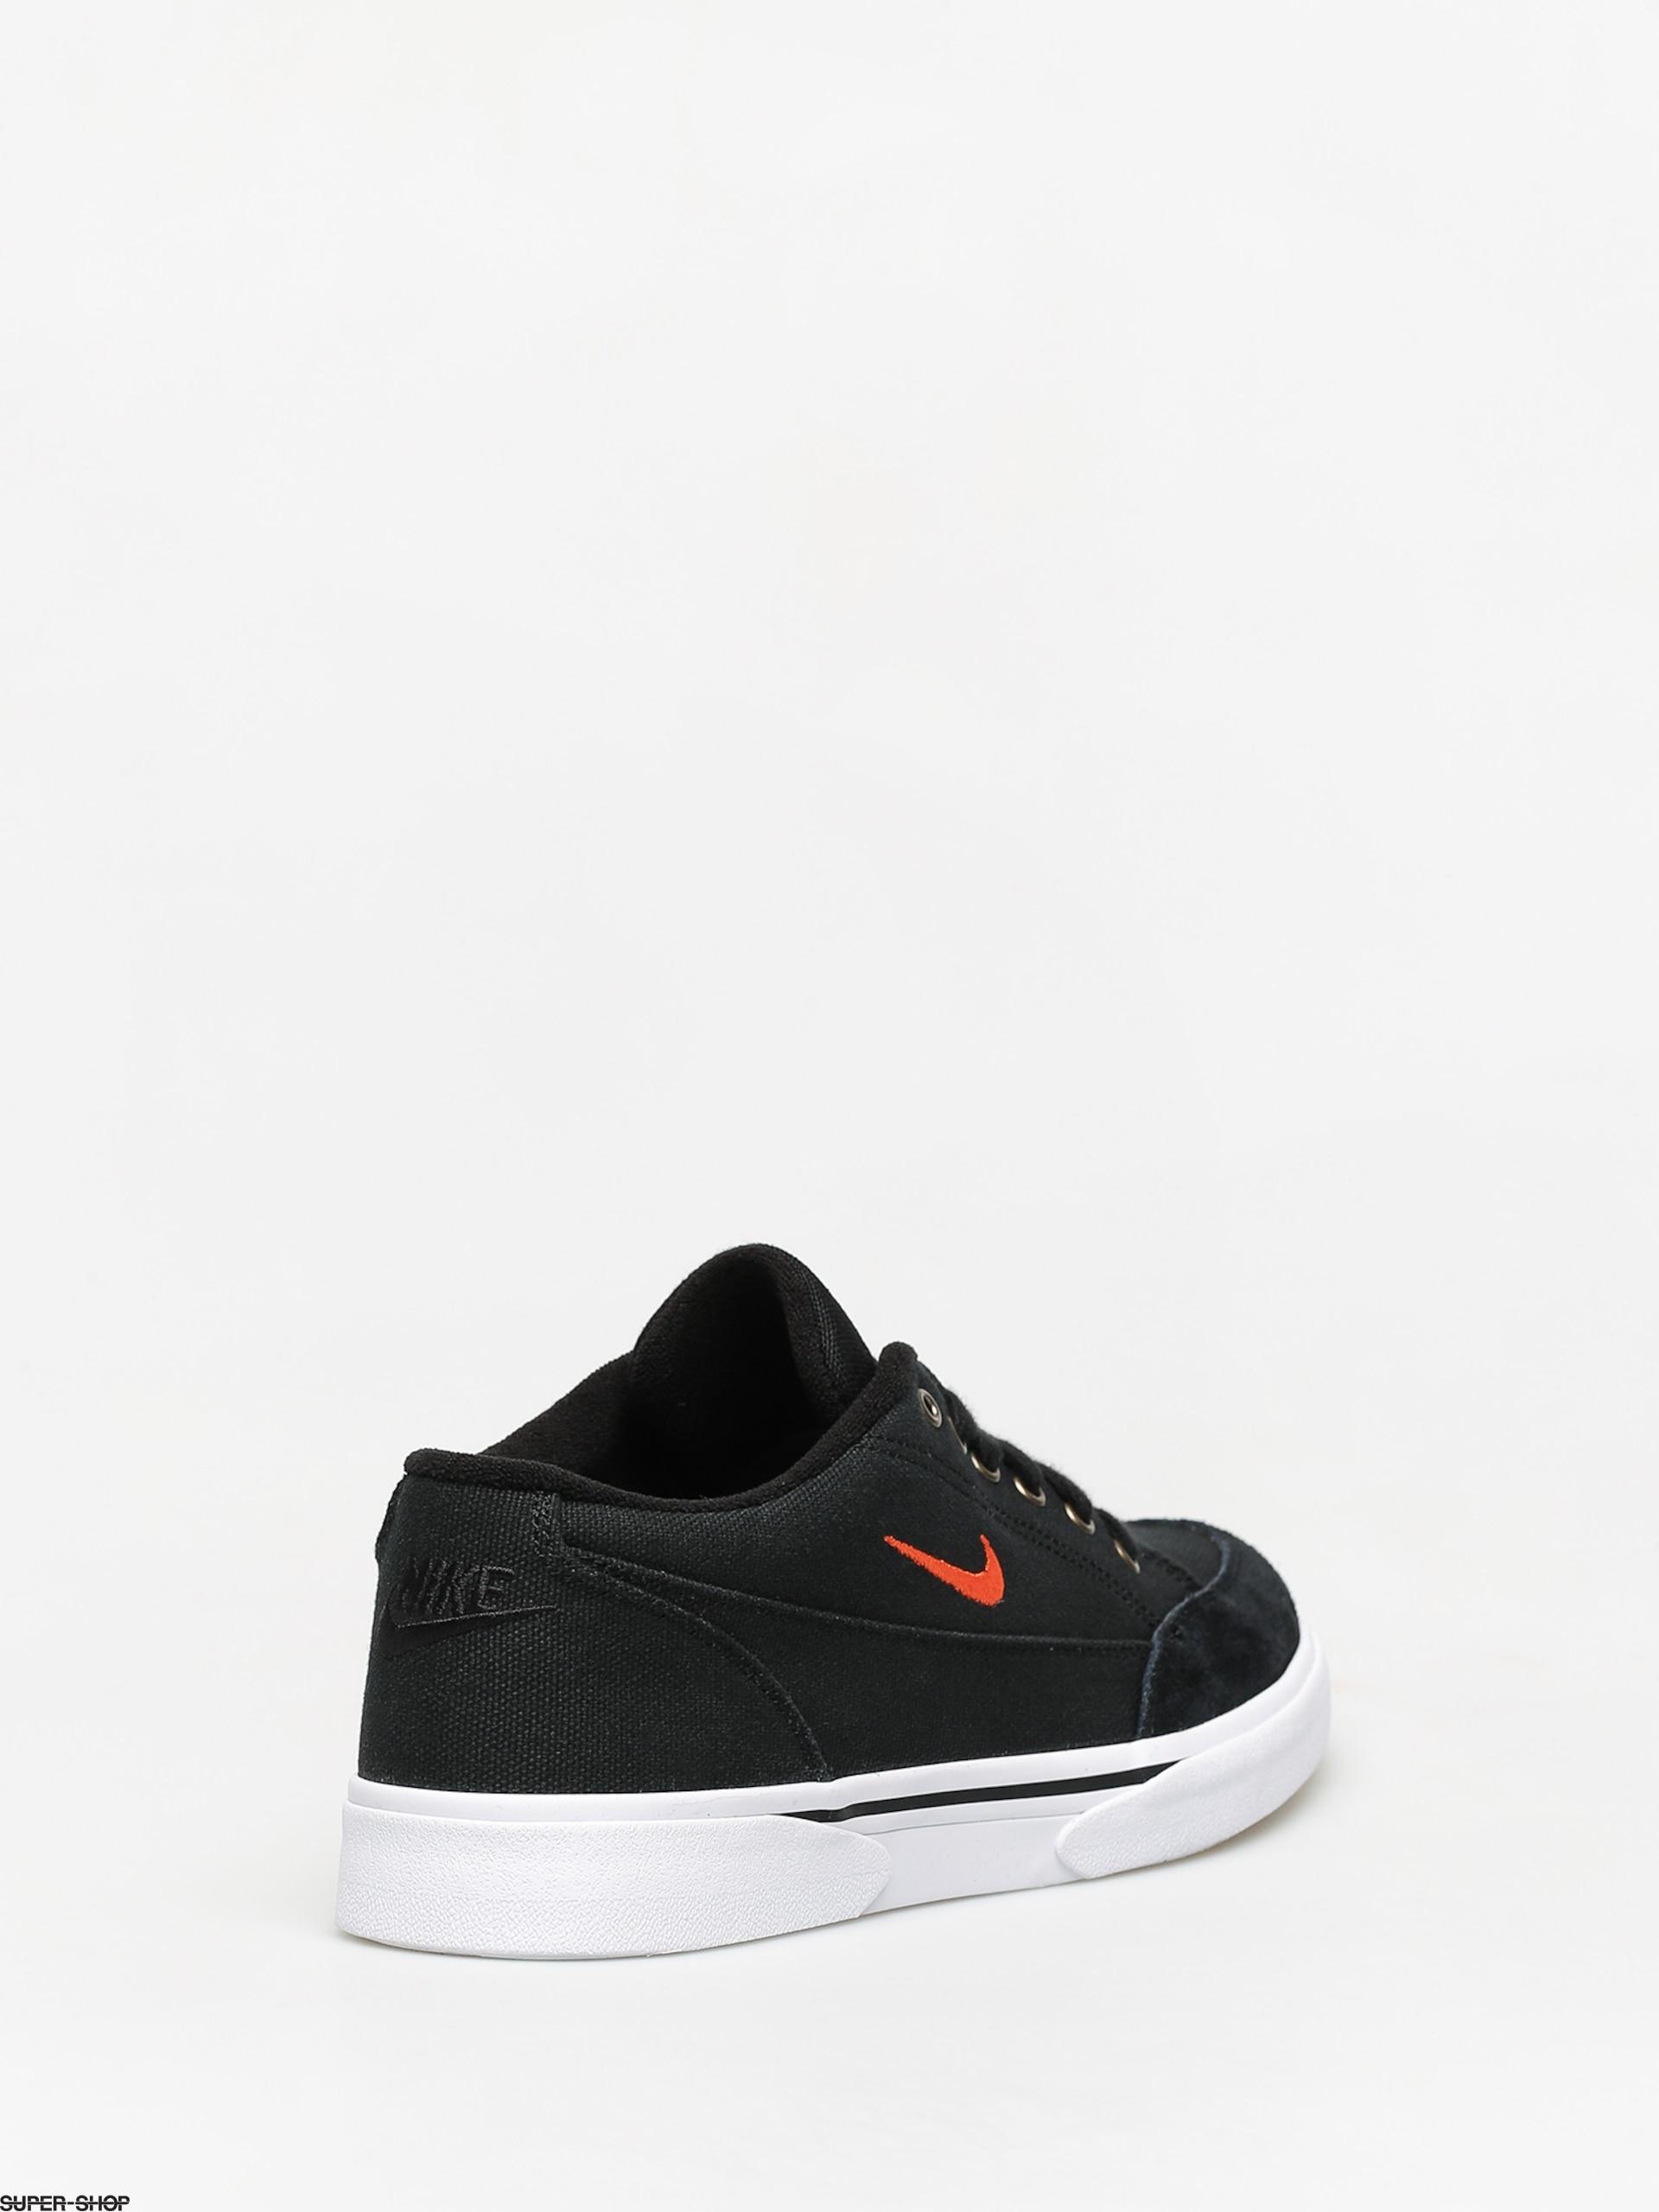 Nike GTS '16 TXT (BlackTeam Orange